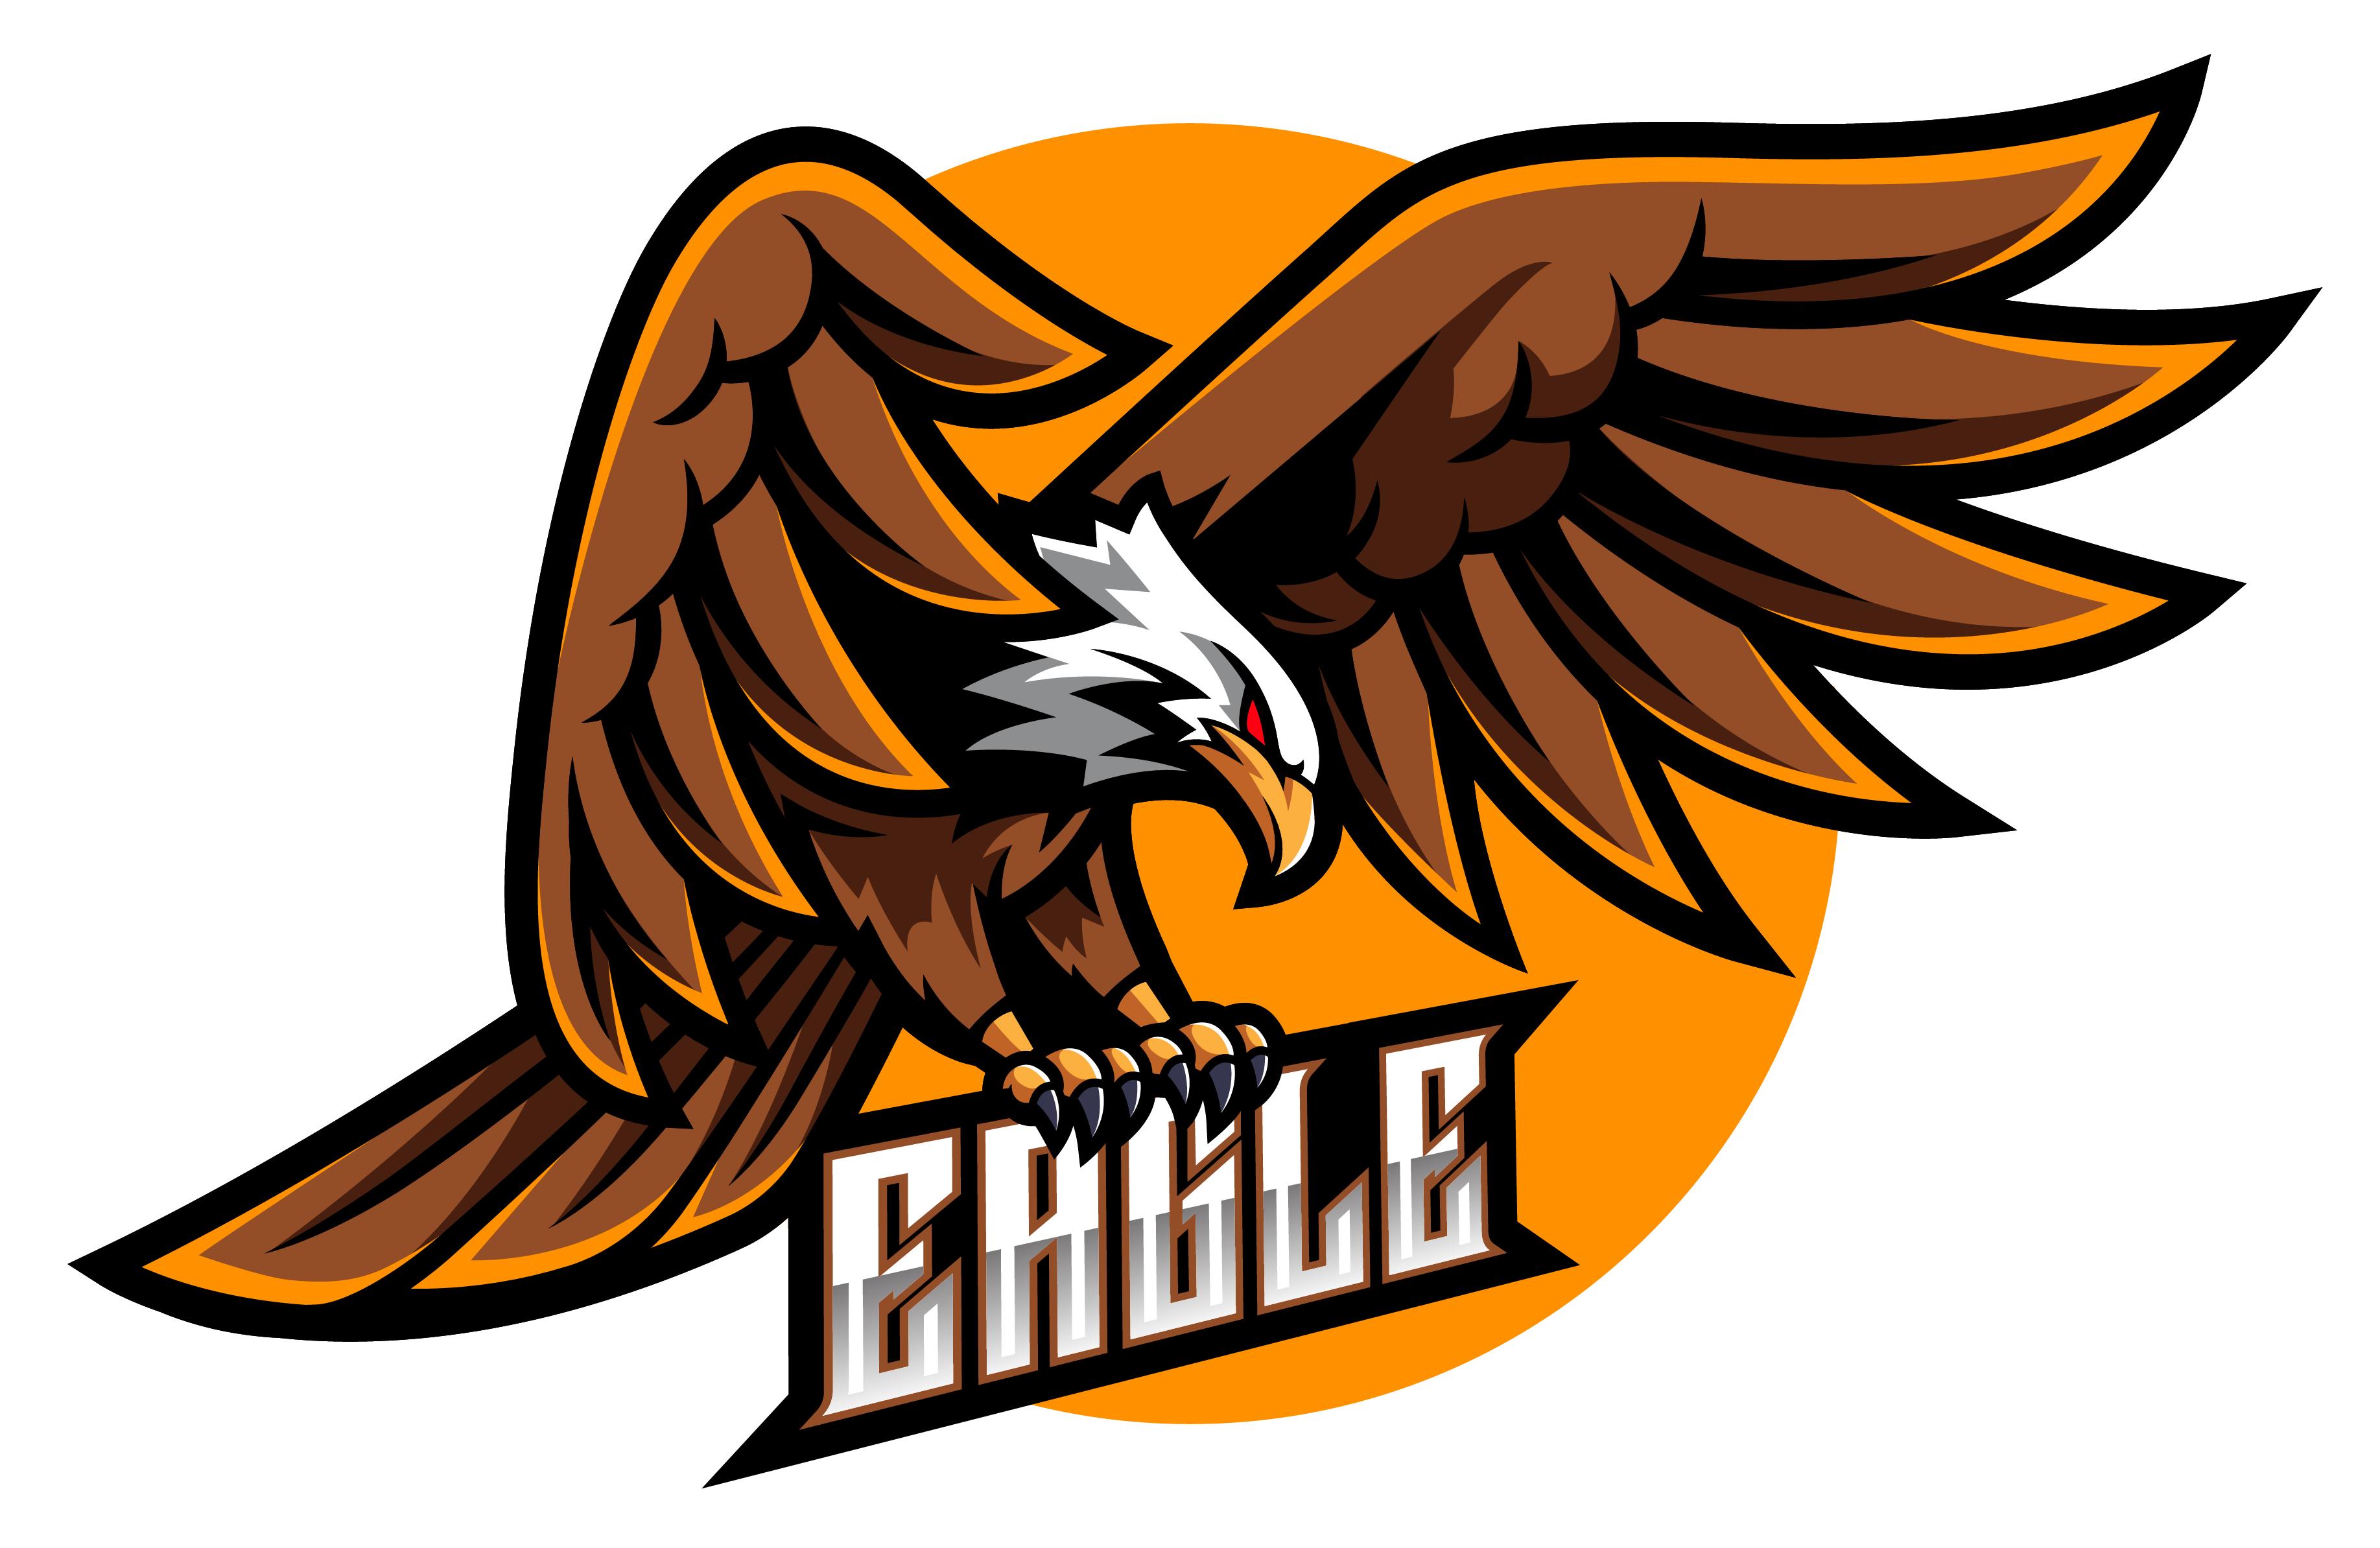 Eagle esport mascot logo design By Visink TheHungryJPEG